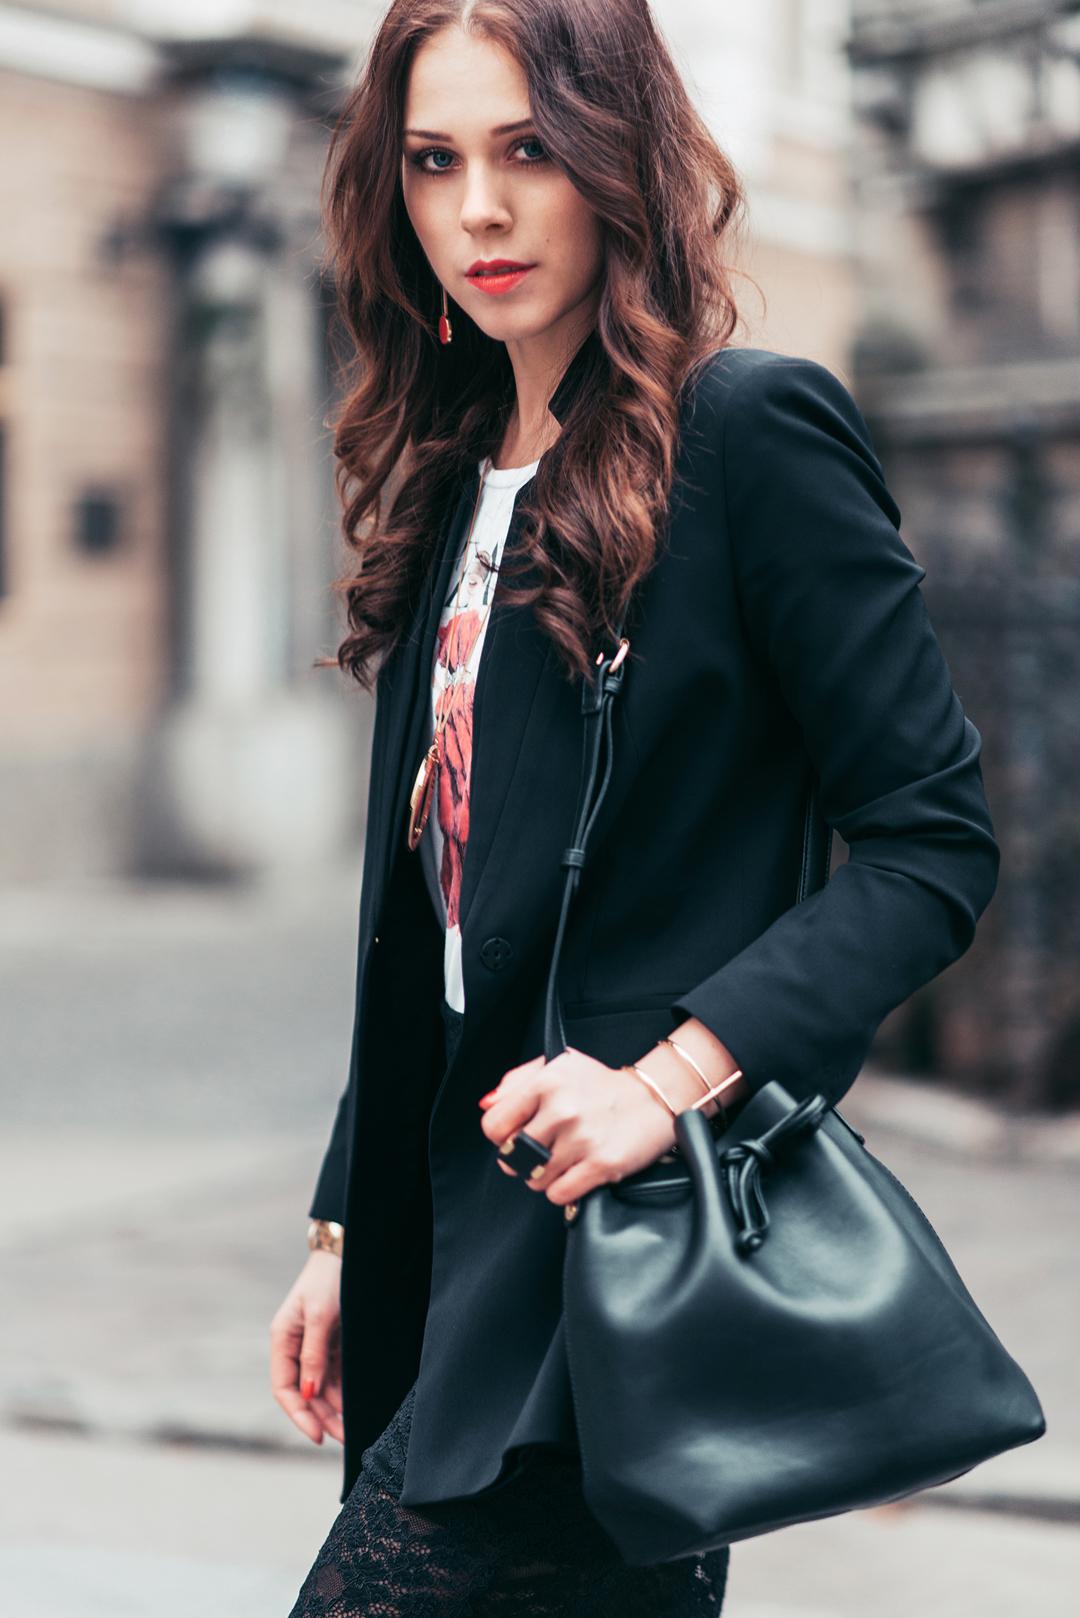 eva-ahacevcic_love-eva_ootd_six-accessories_zara-skirt_blazer_parfois-shoes_style_fashion-6